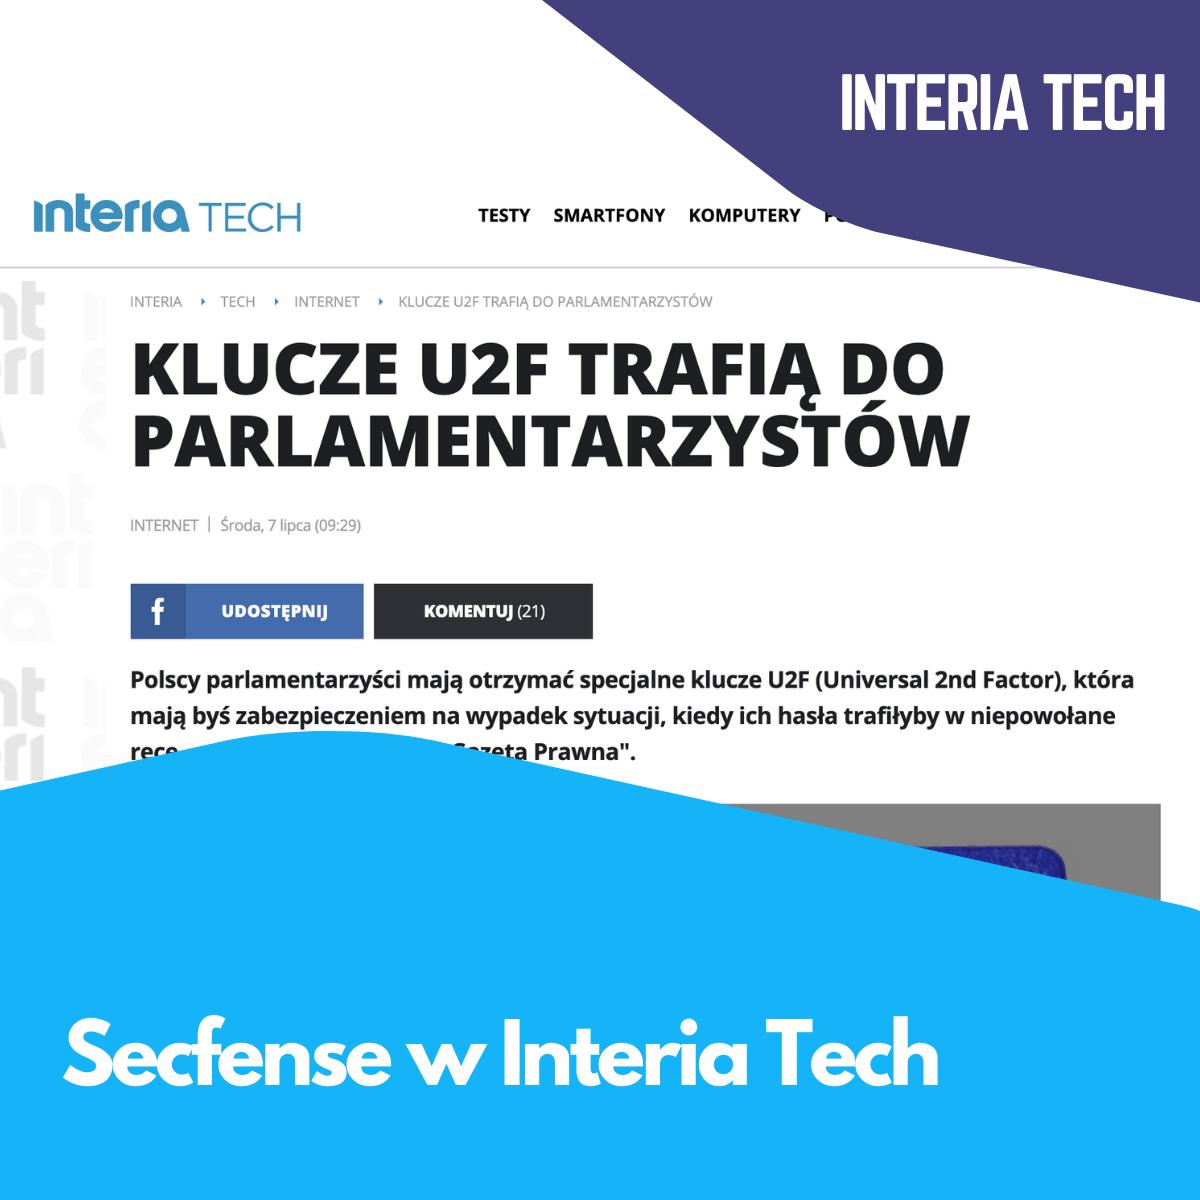 Secfense w Interia Tech